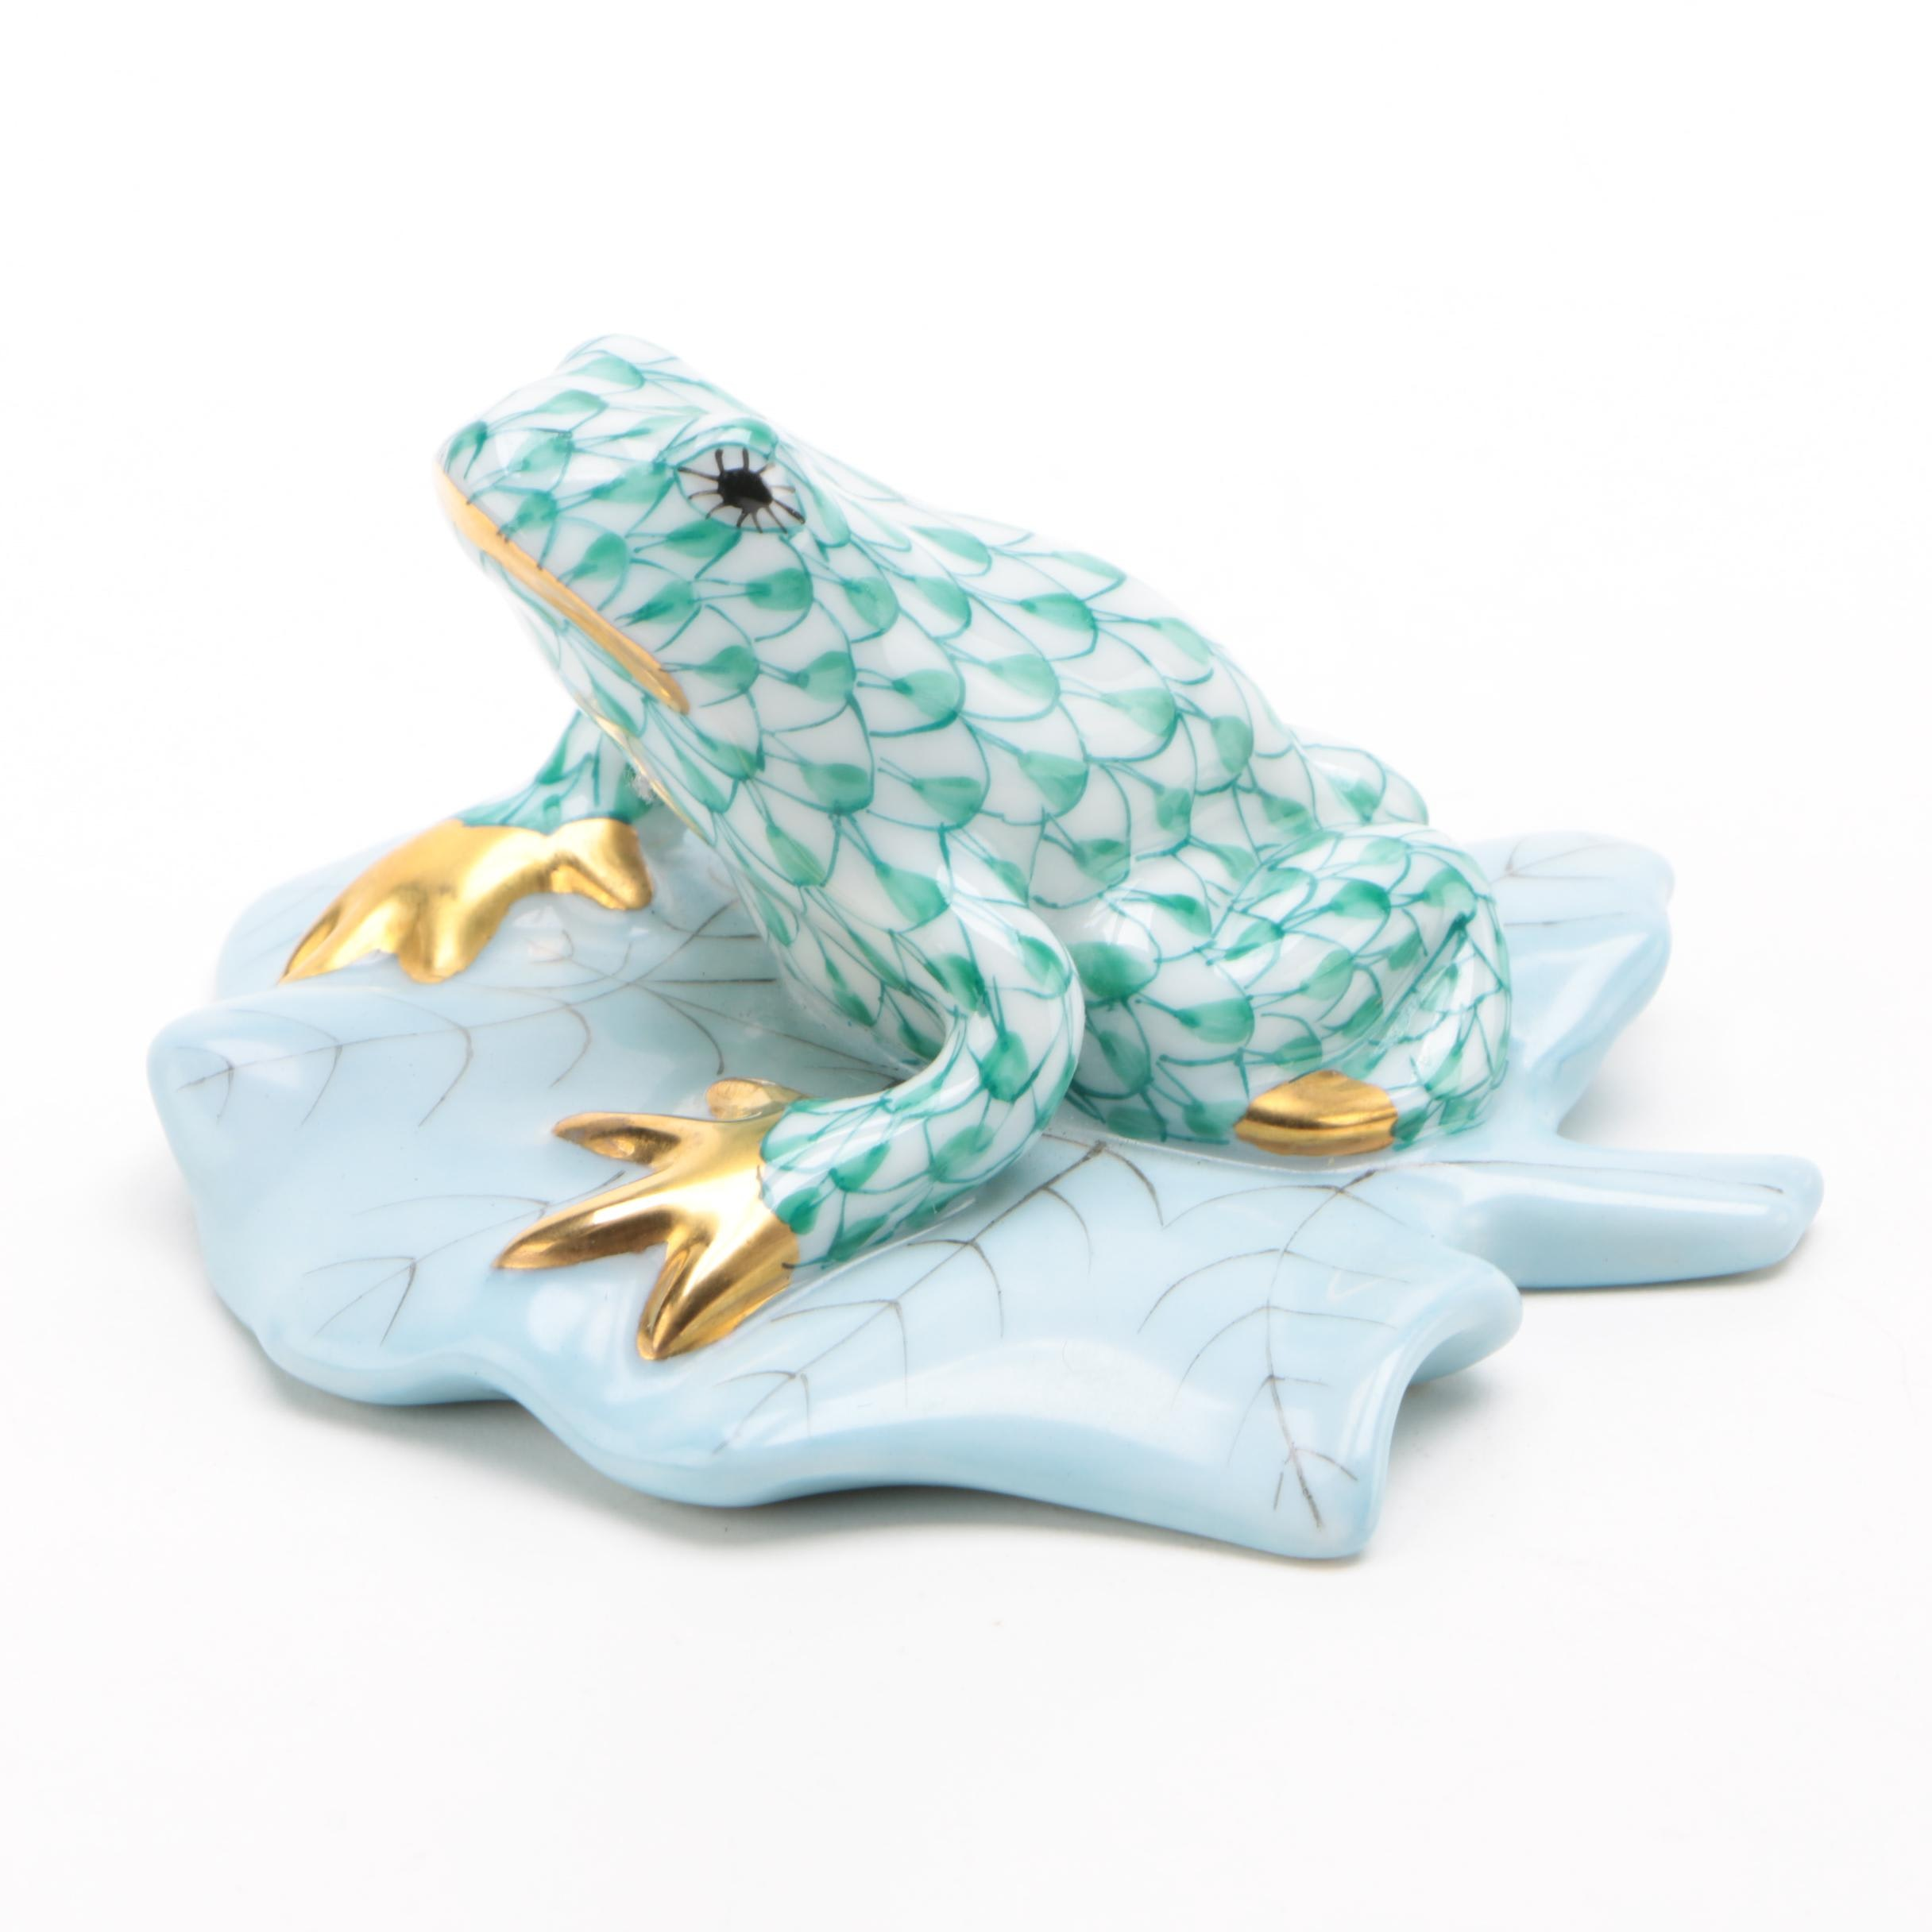 "Herend Green Fishnet ""Frog on Lily Pad"" Porcelain Figurine, April 1993"